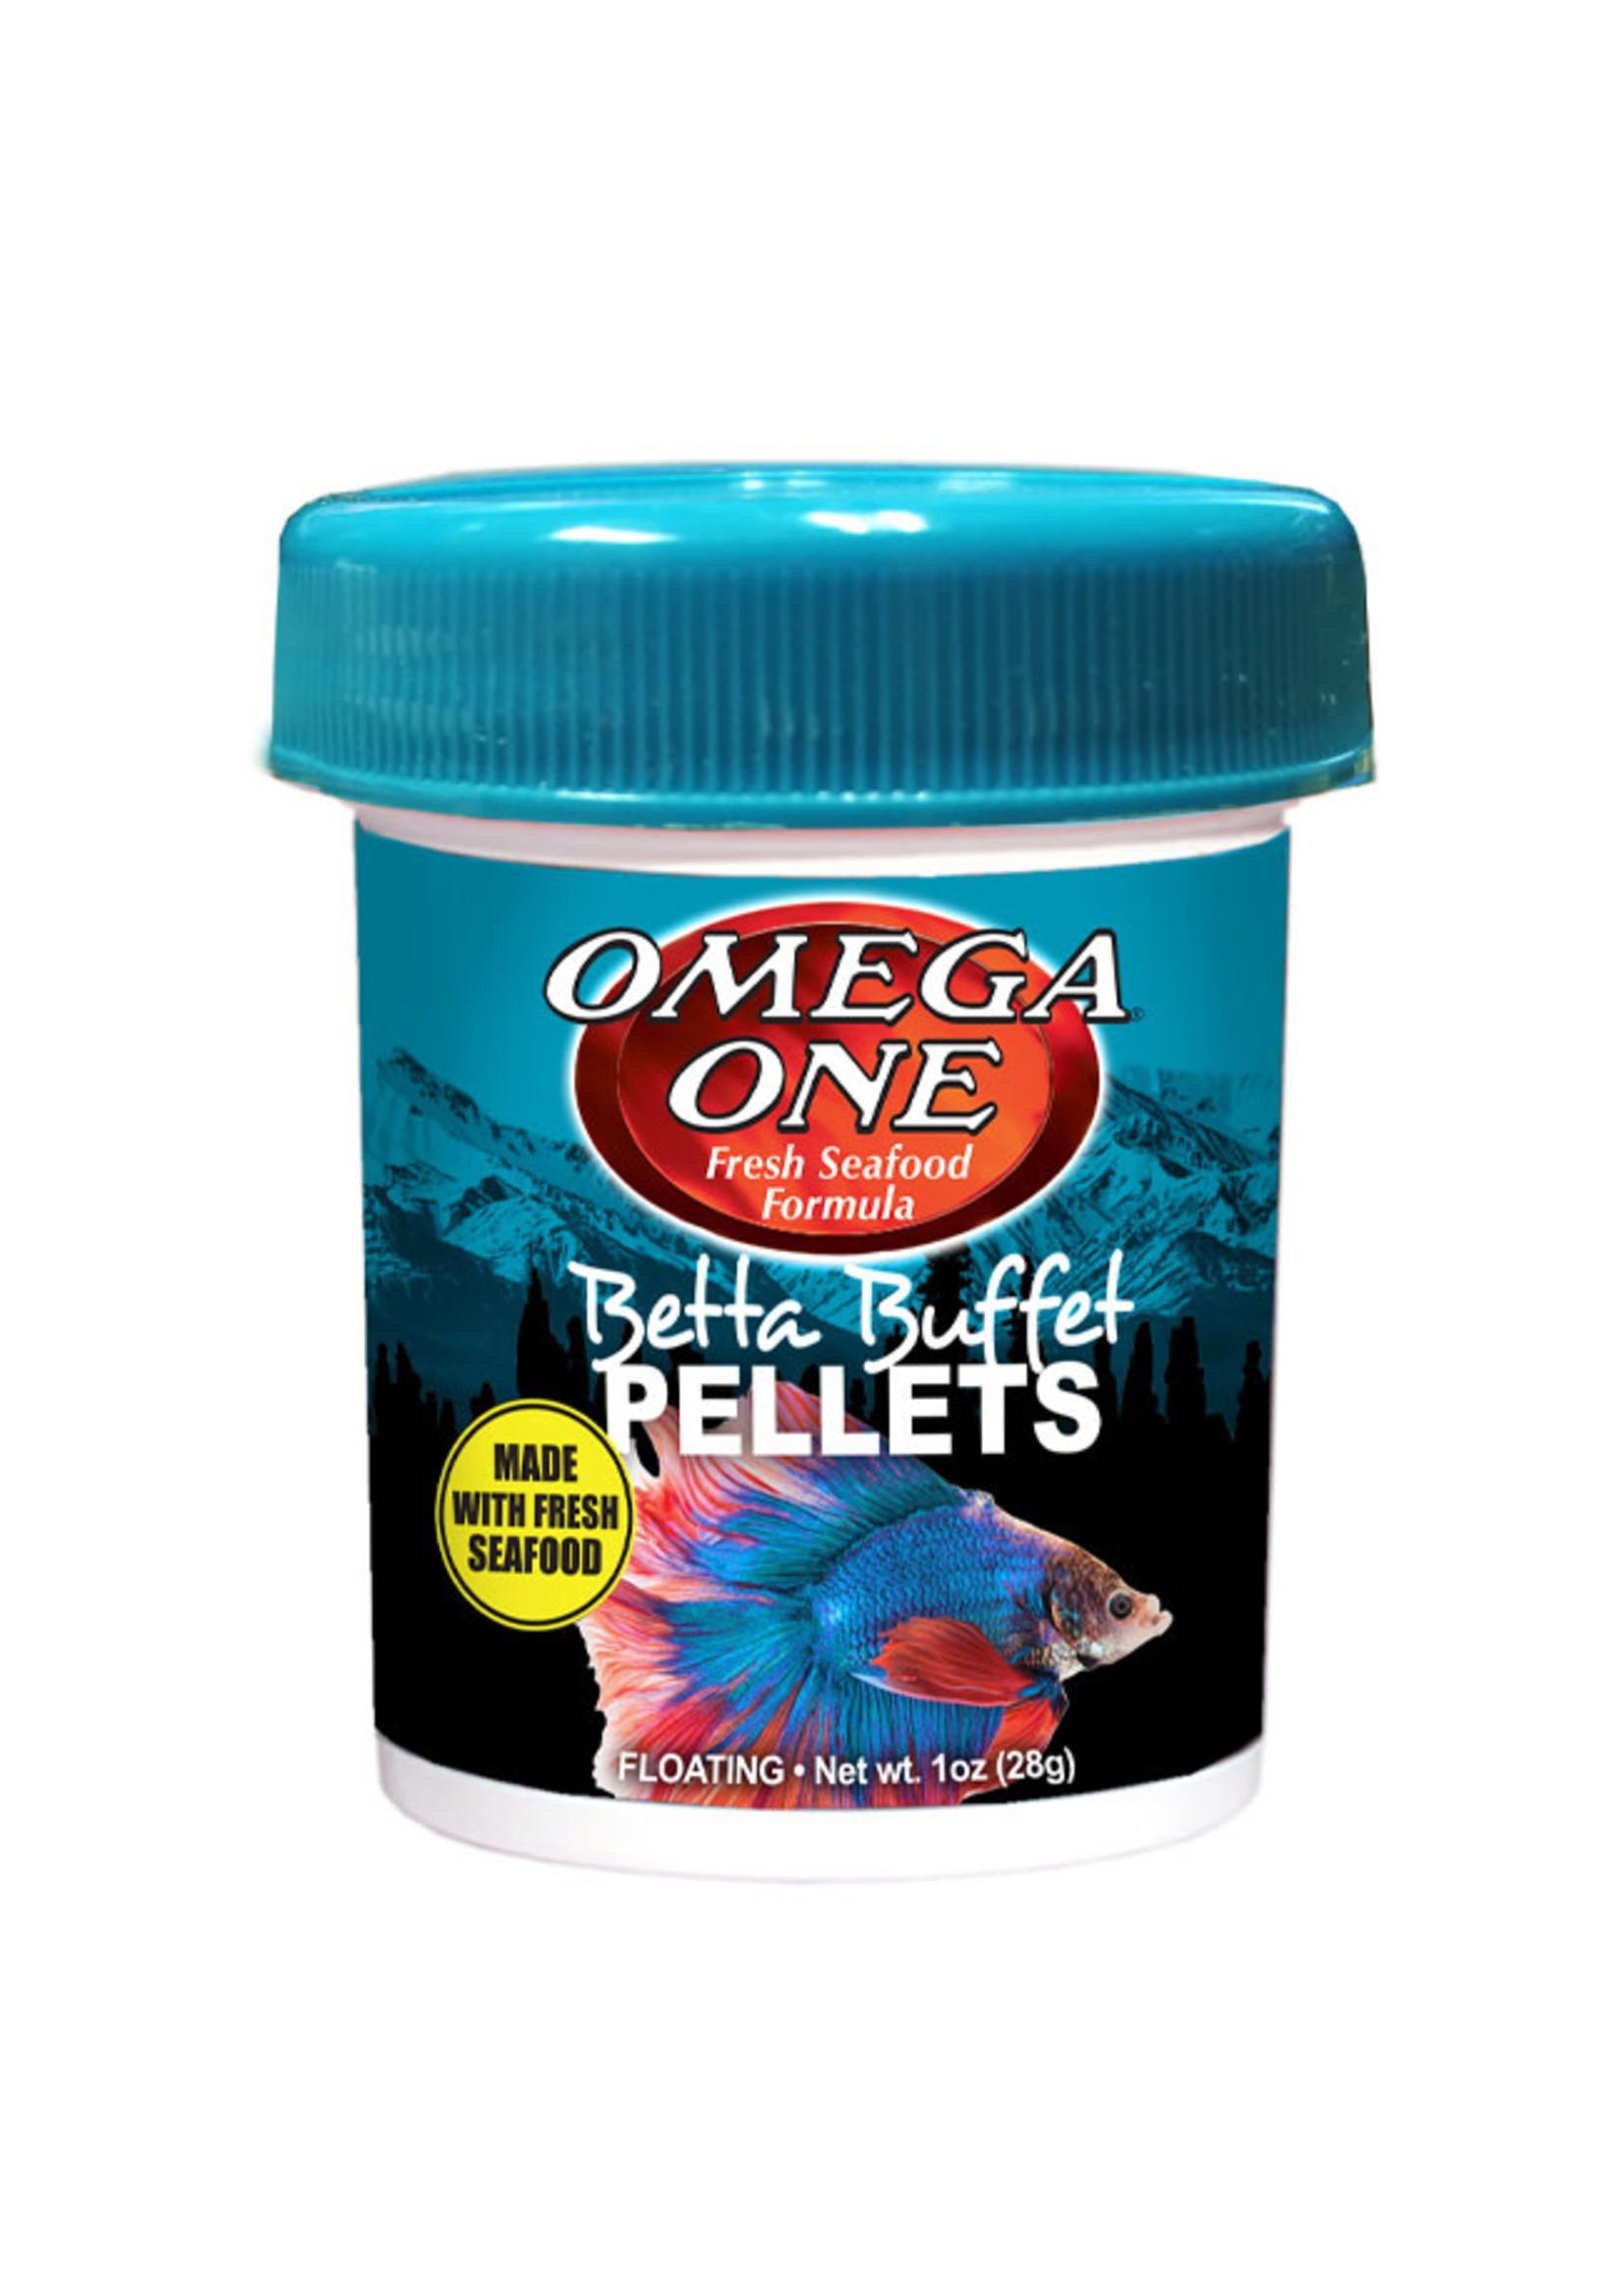 Omega One Omega One Betta Buffet Pellets 28g / 1oz